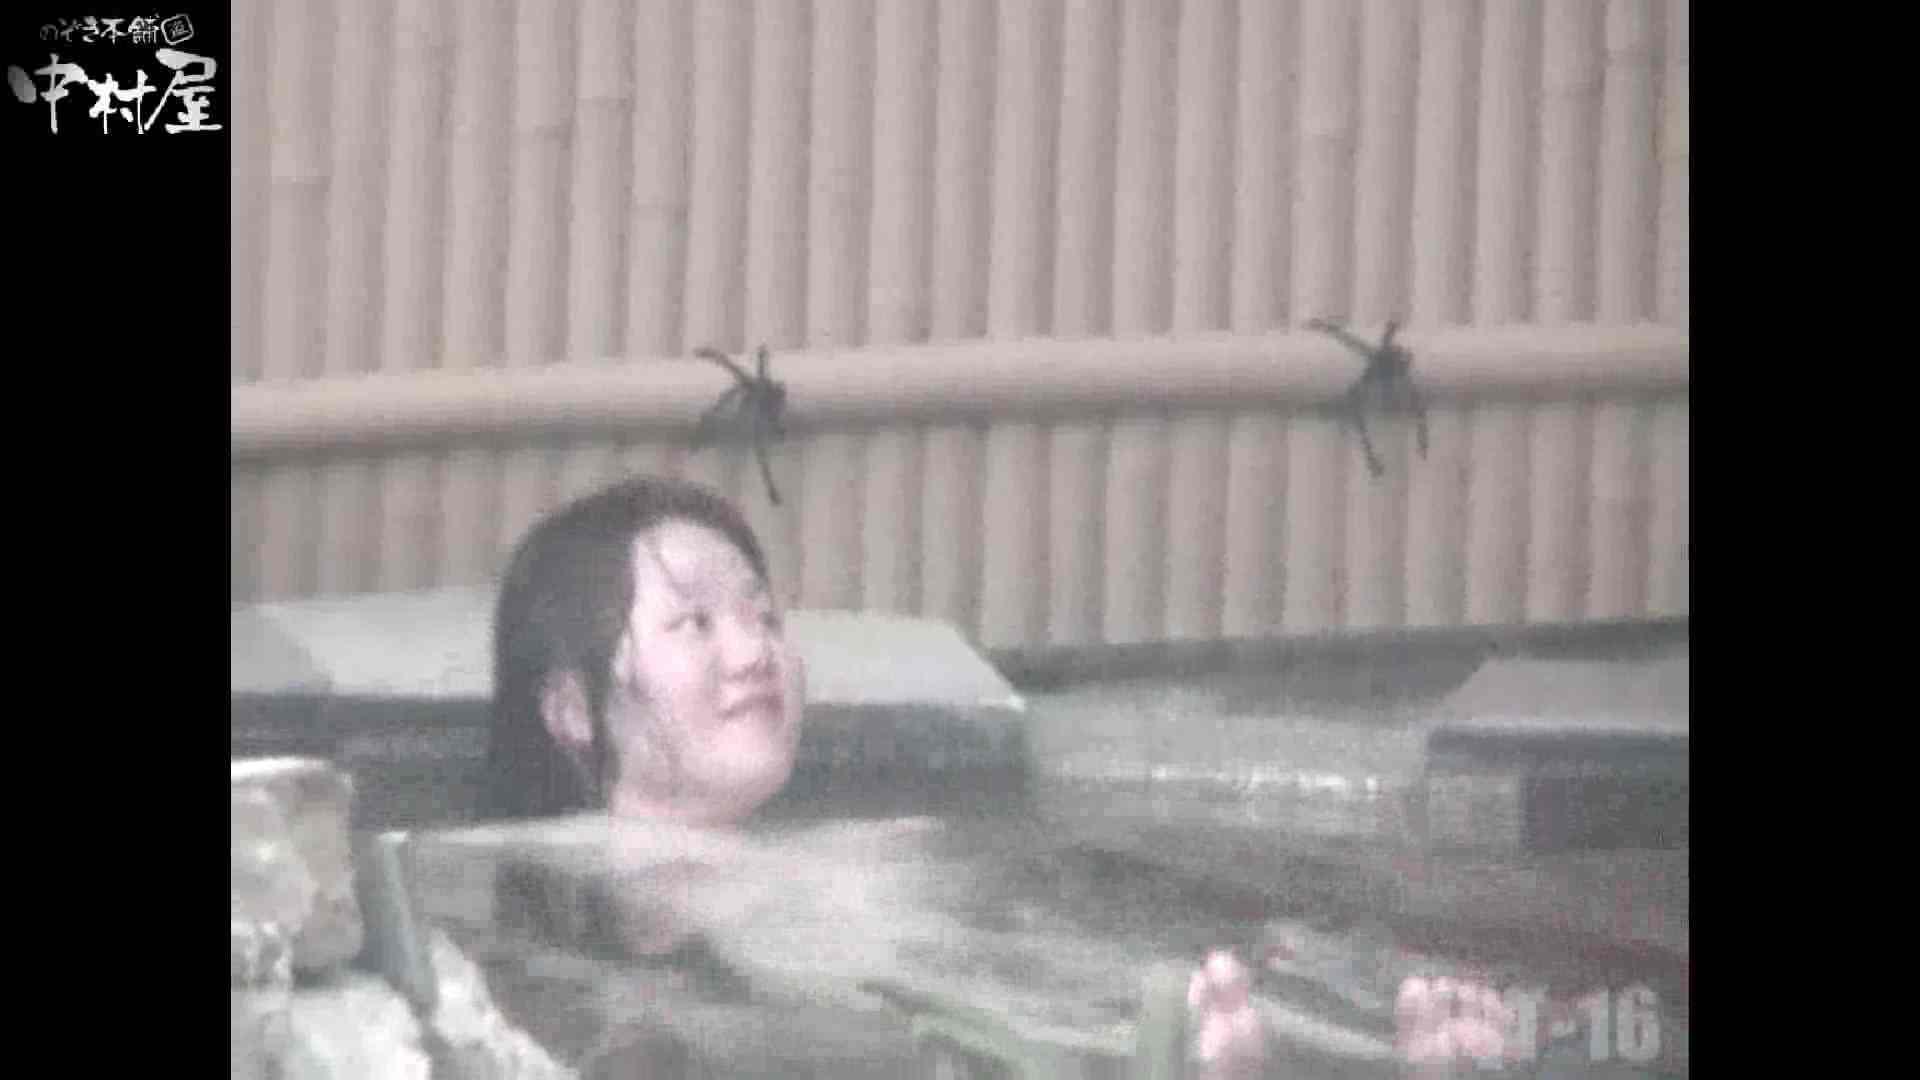 Aquaな露天風呂Vol.880潜入盗撮露天風呂十六判湯 其の八 潜入シリーズ | 盗撮  84pic 50